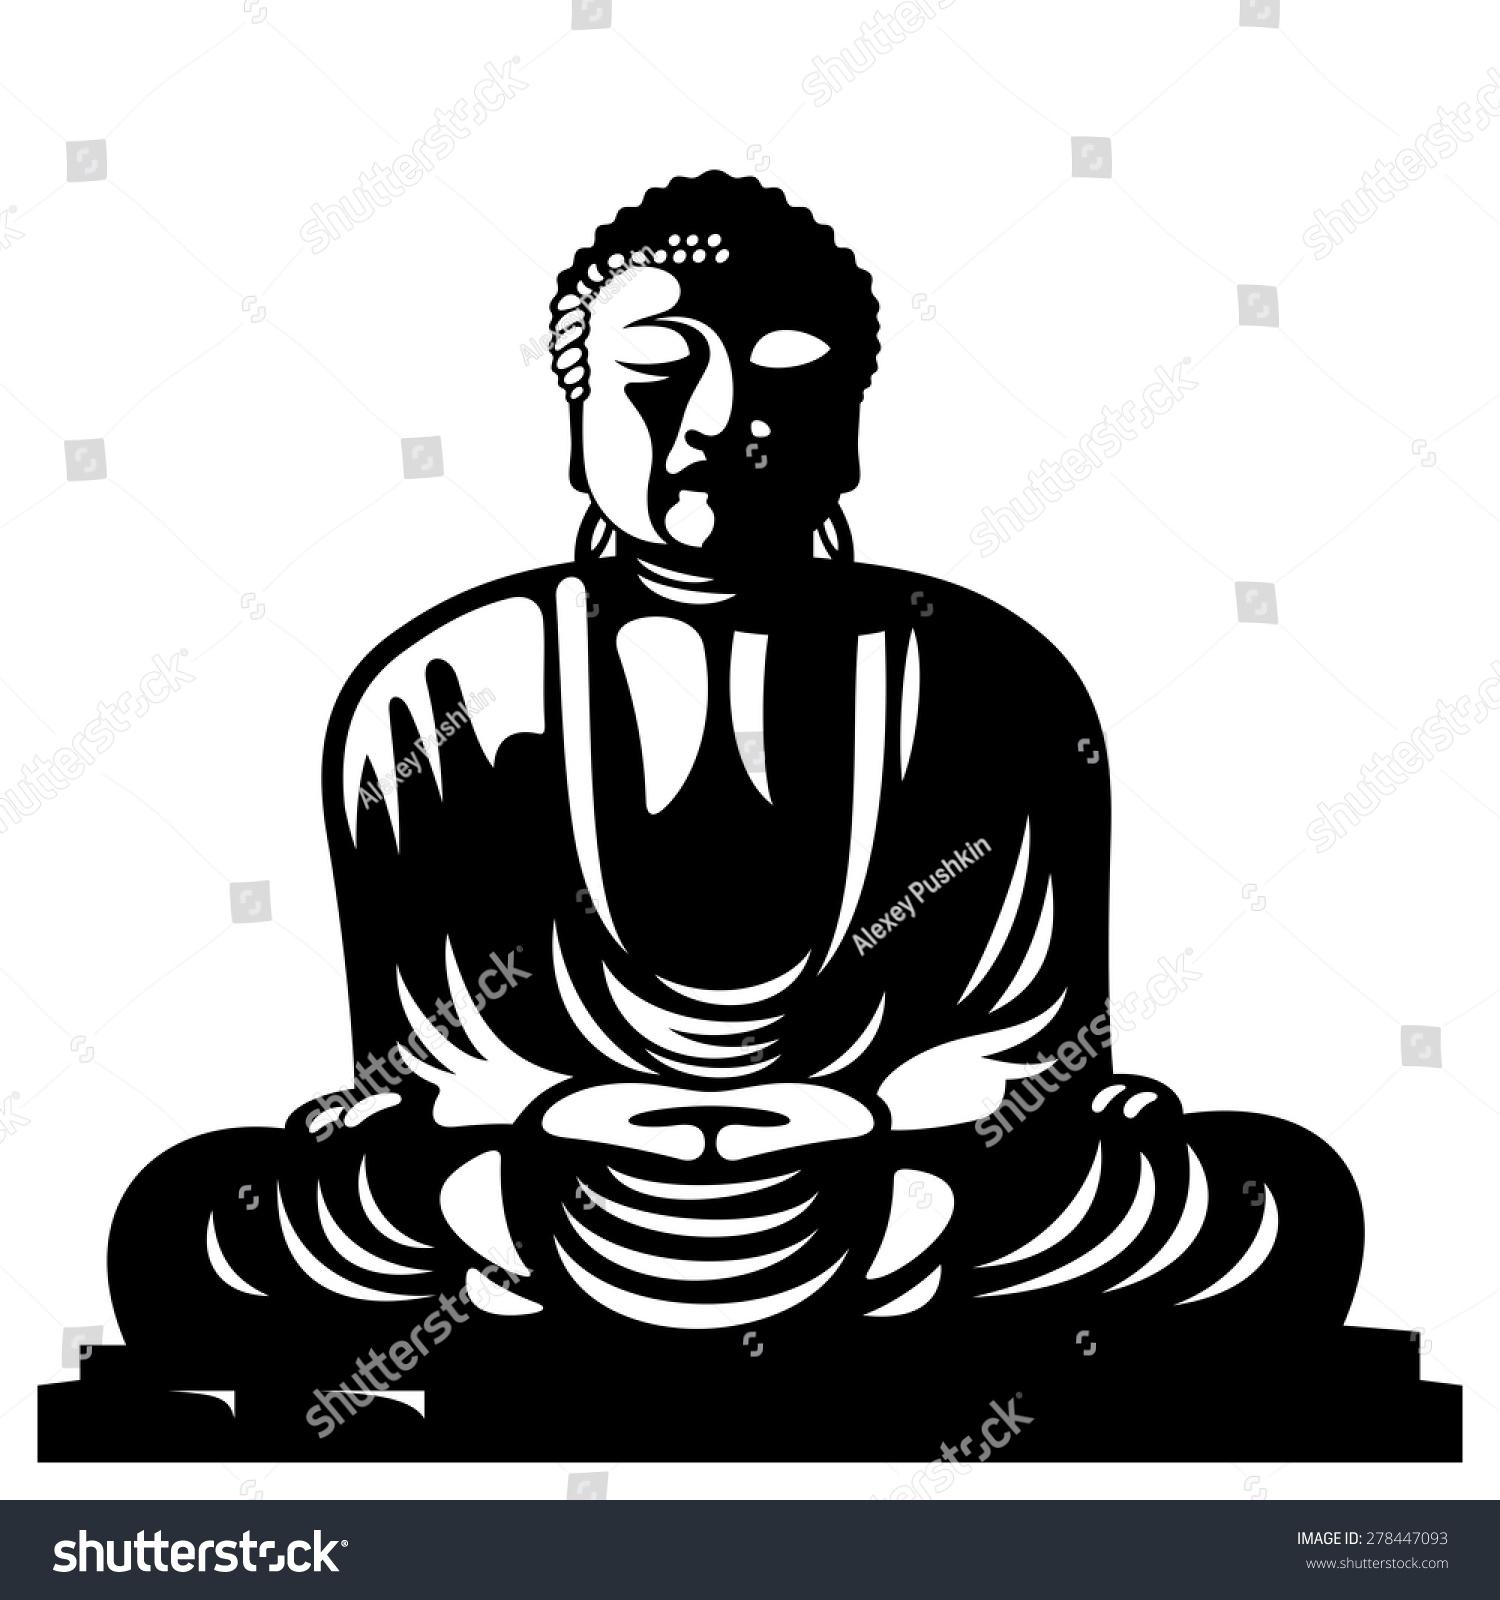 Statue buddha sitting lotus position asian stock vector 278447093 statue of buddha sitting in the lotus position asian religious symbol biocorpaavc